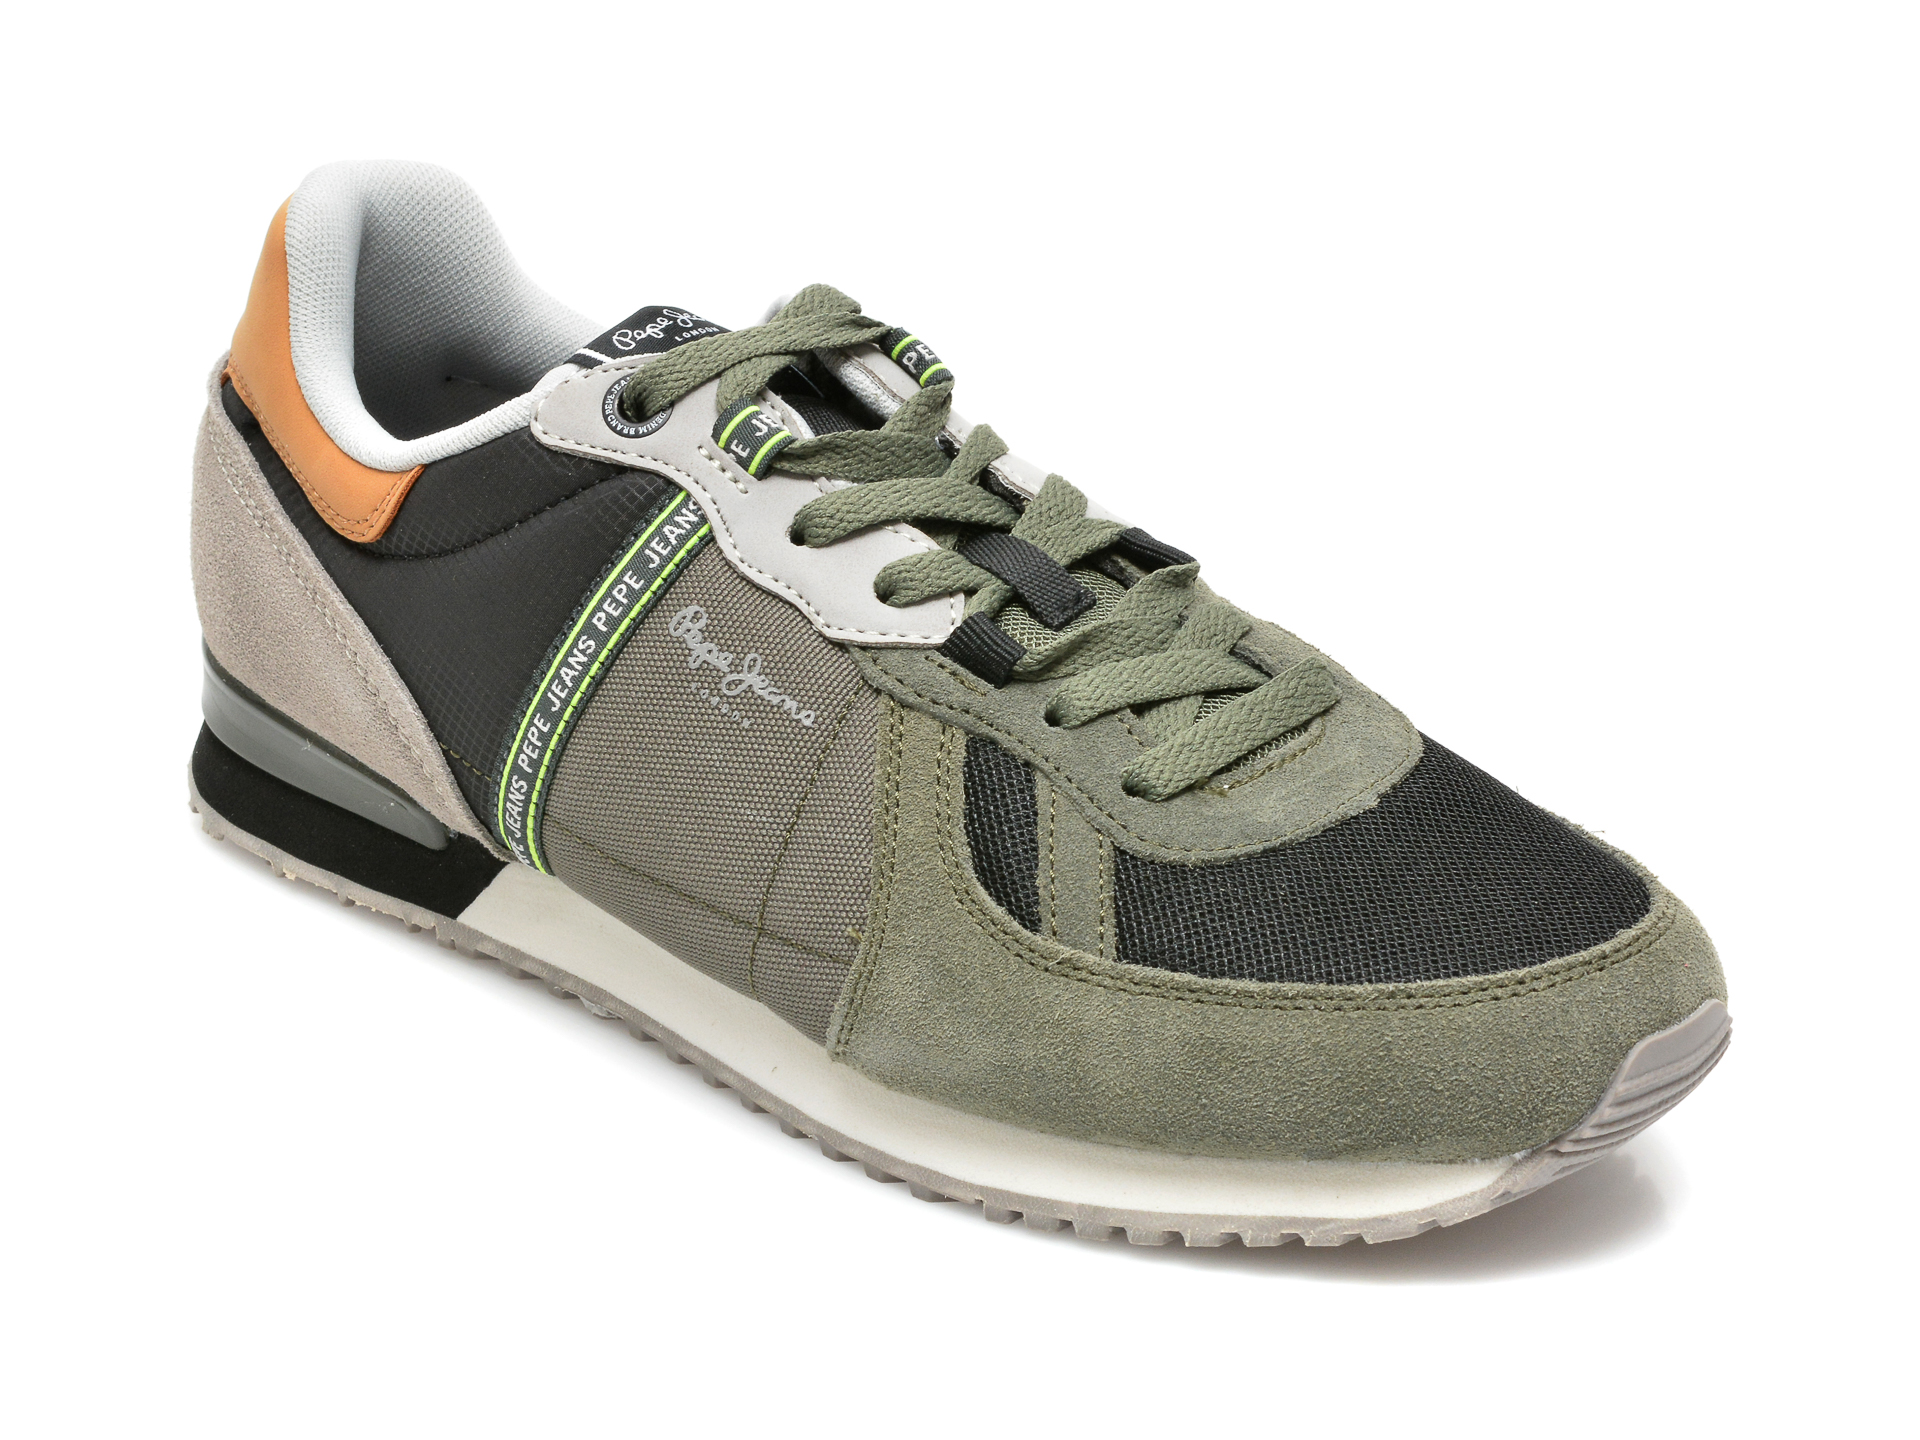 Pantofi sport PEPE JEANS kaki, MS30772, din material textil si piele naturala